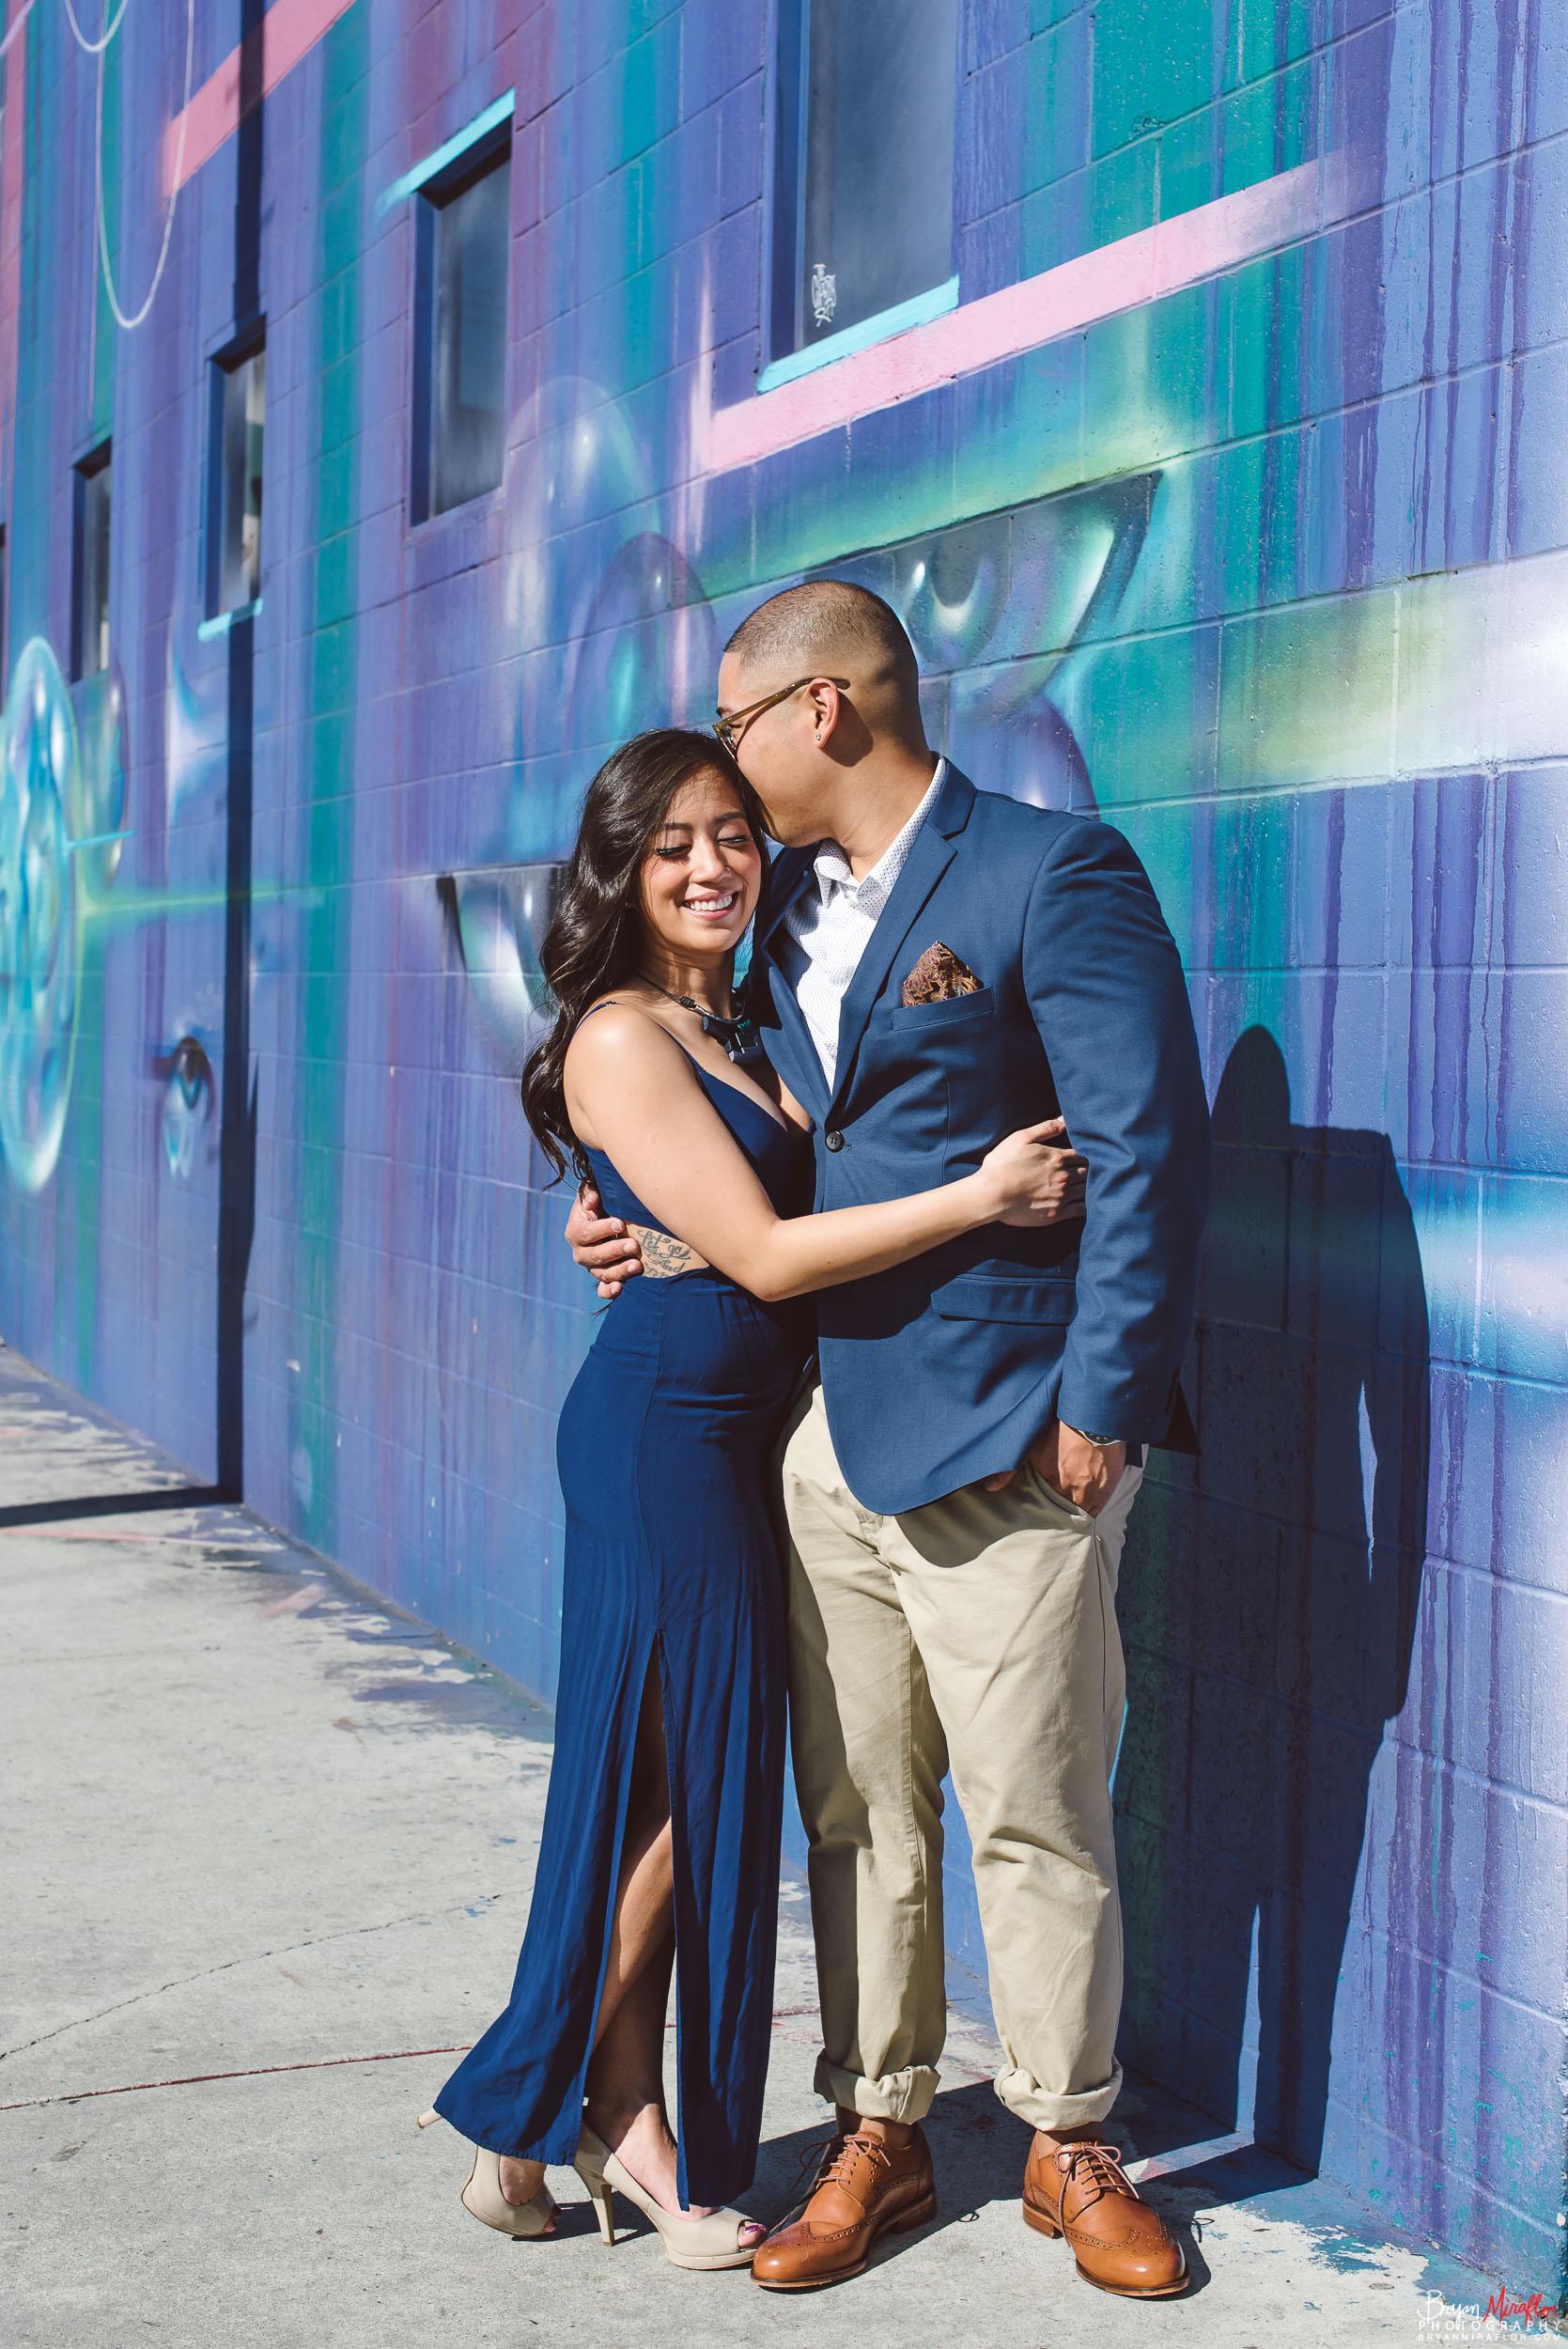 Bryan-Miraflor-Photography-Trisha-Dexter-Lopez-Engagement-Formal-DTLA-Arts-20170129-0113.jpg